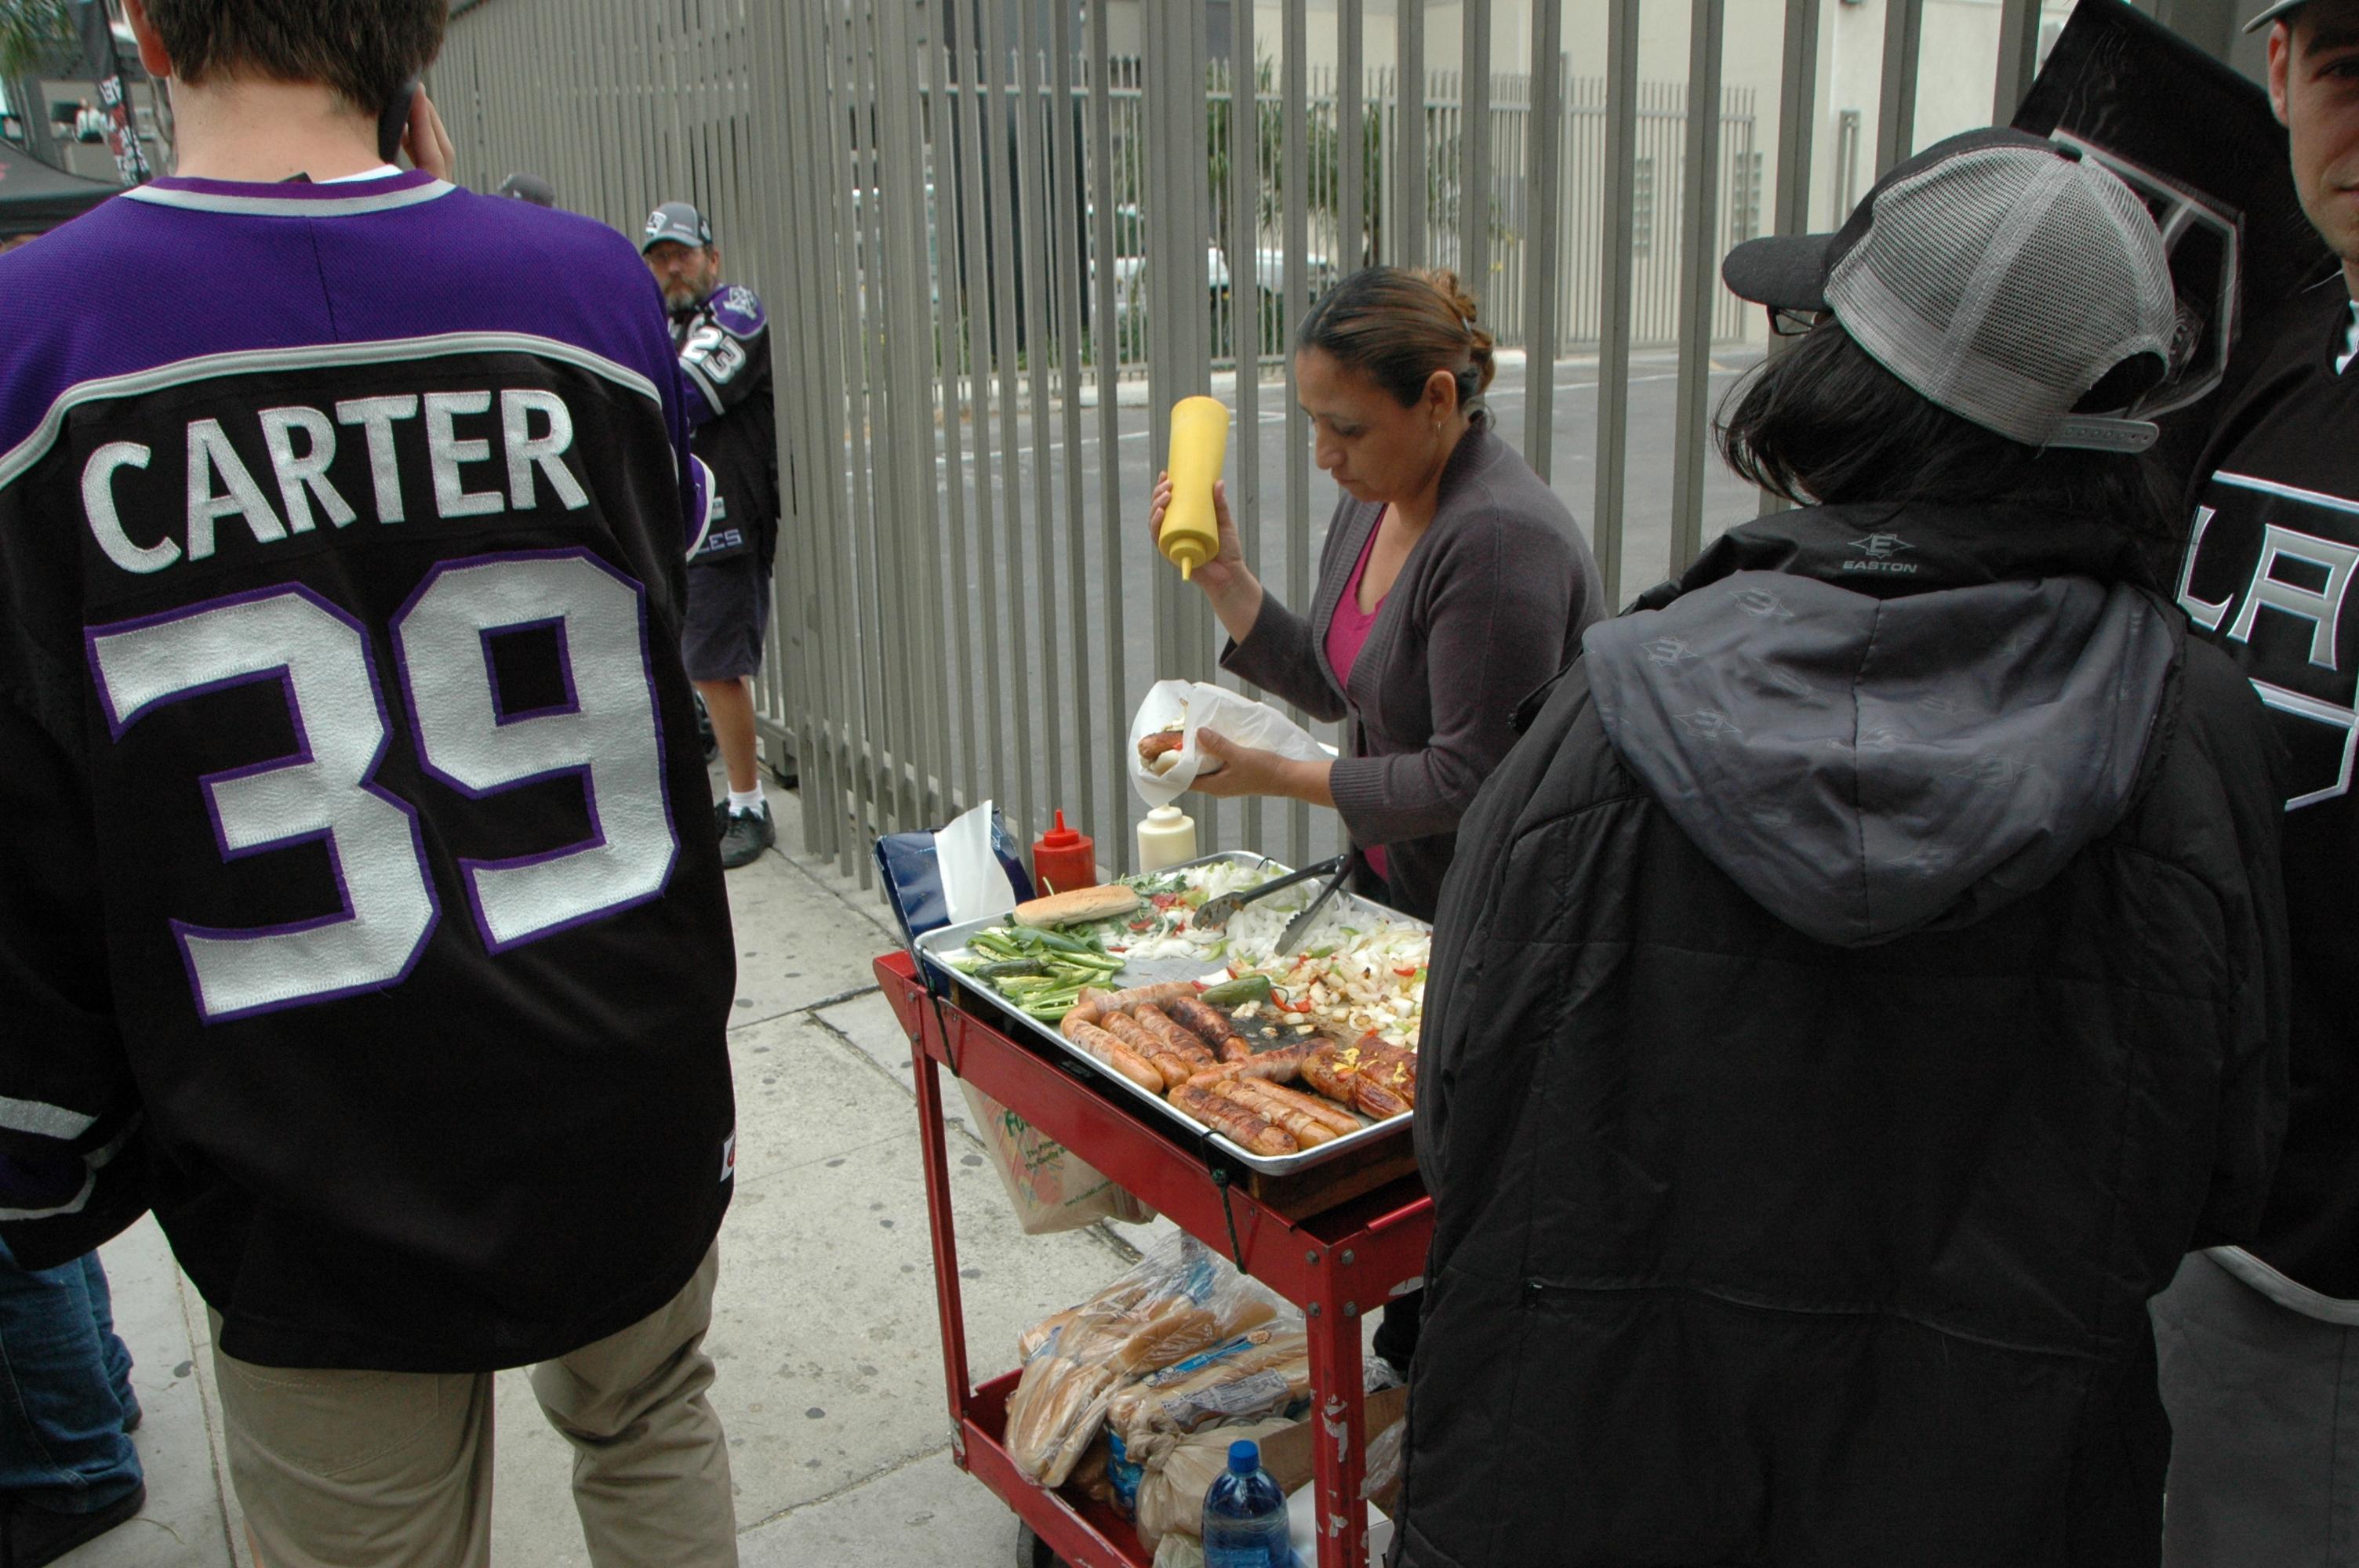 Los ya famosísimos Hot Dogs de Los Angeles en plena vendimia. (Foto José Ubaldo/El Pasajero).